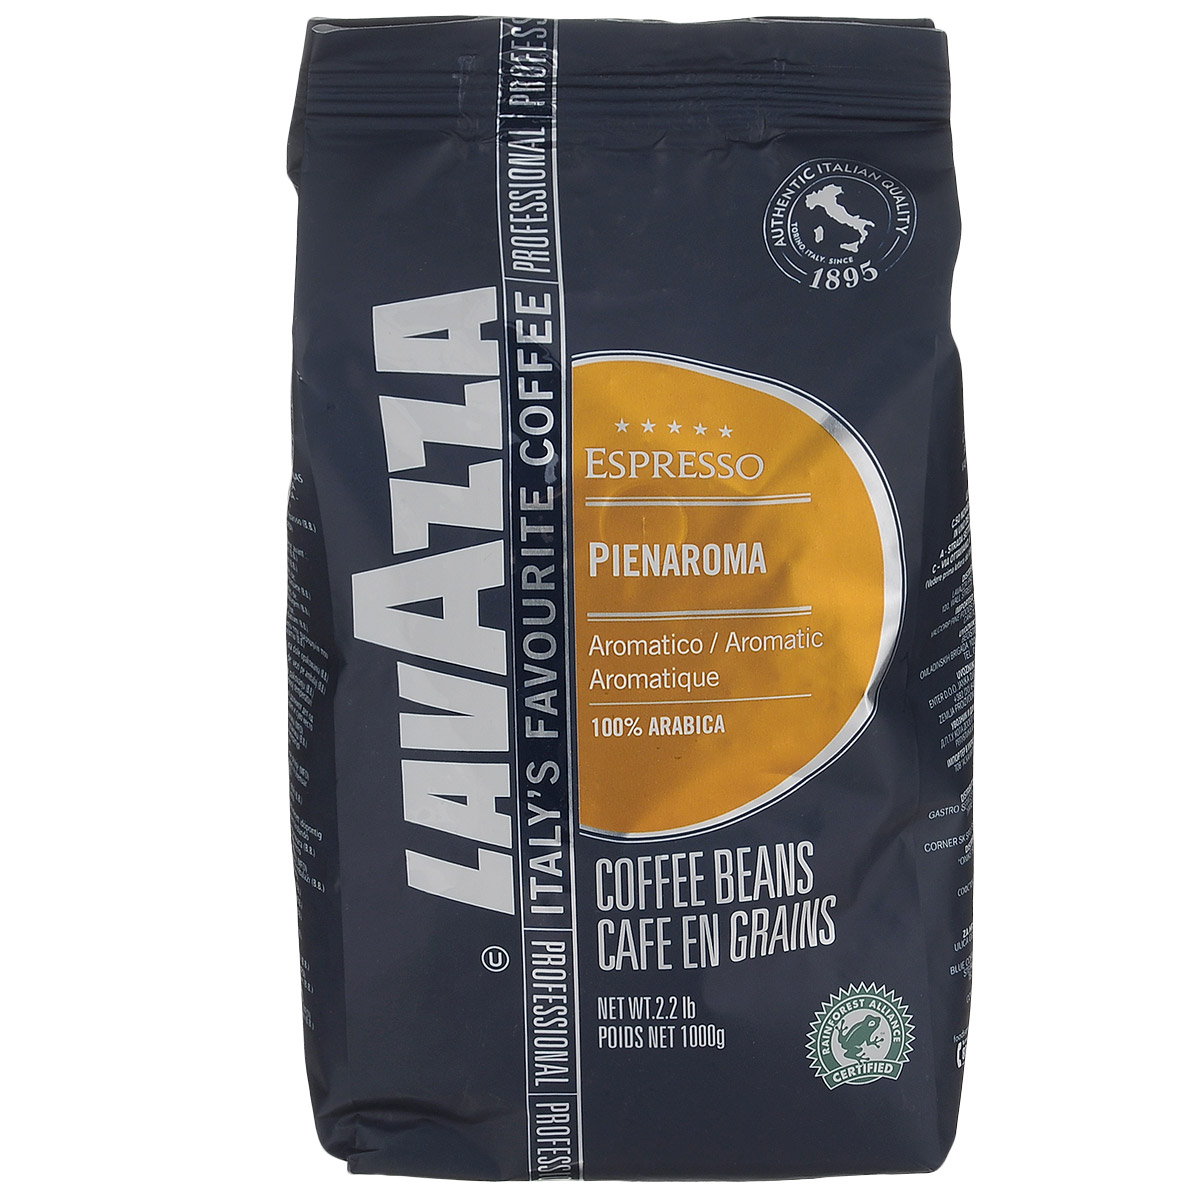 Lavazza Pienaroma кофе в зернах, 1 кг кофе в зернах lavazza 3590 rossa 1кг